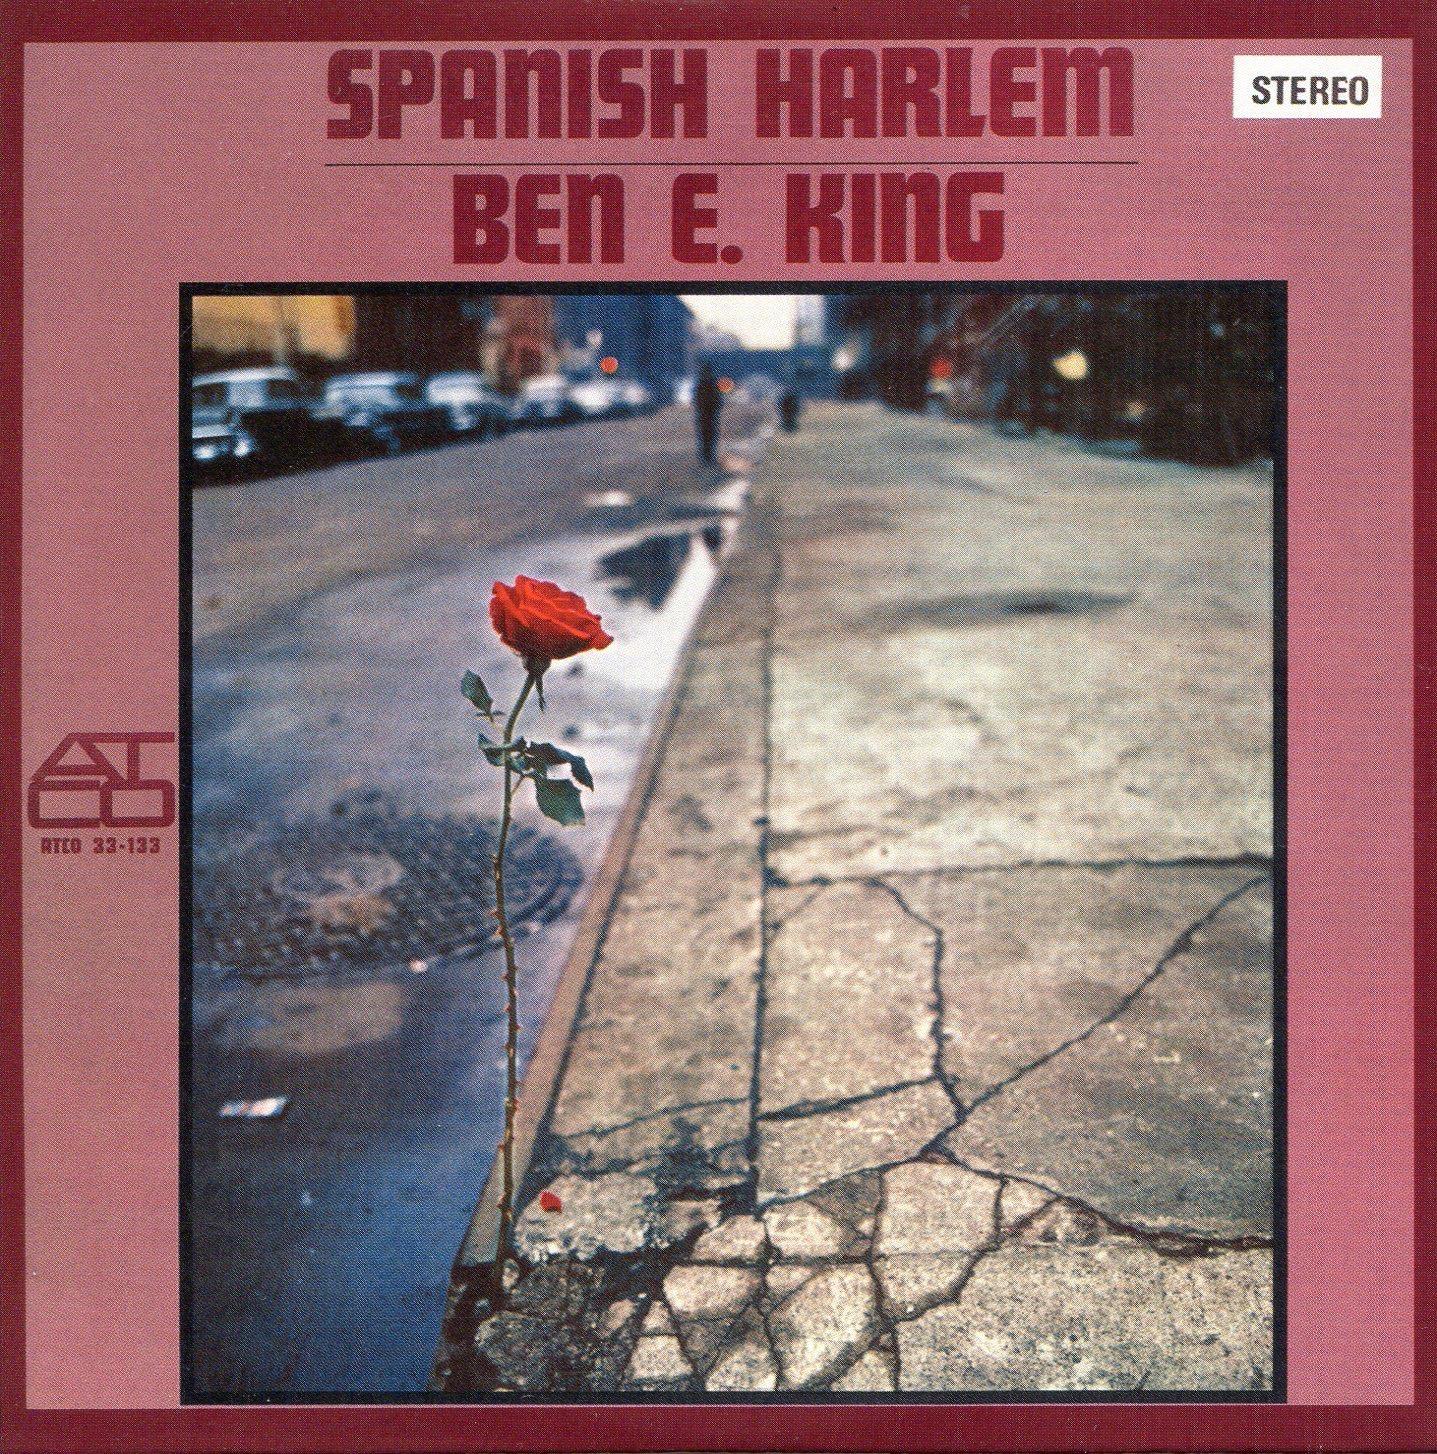 Art for Spanish Harlem (Radio Edit) by Ben E. King